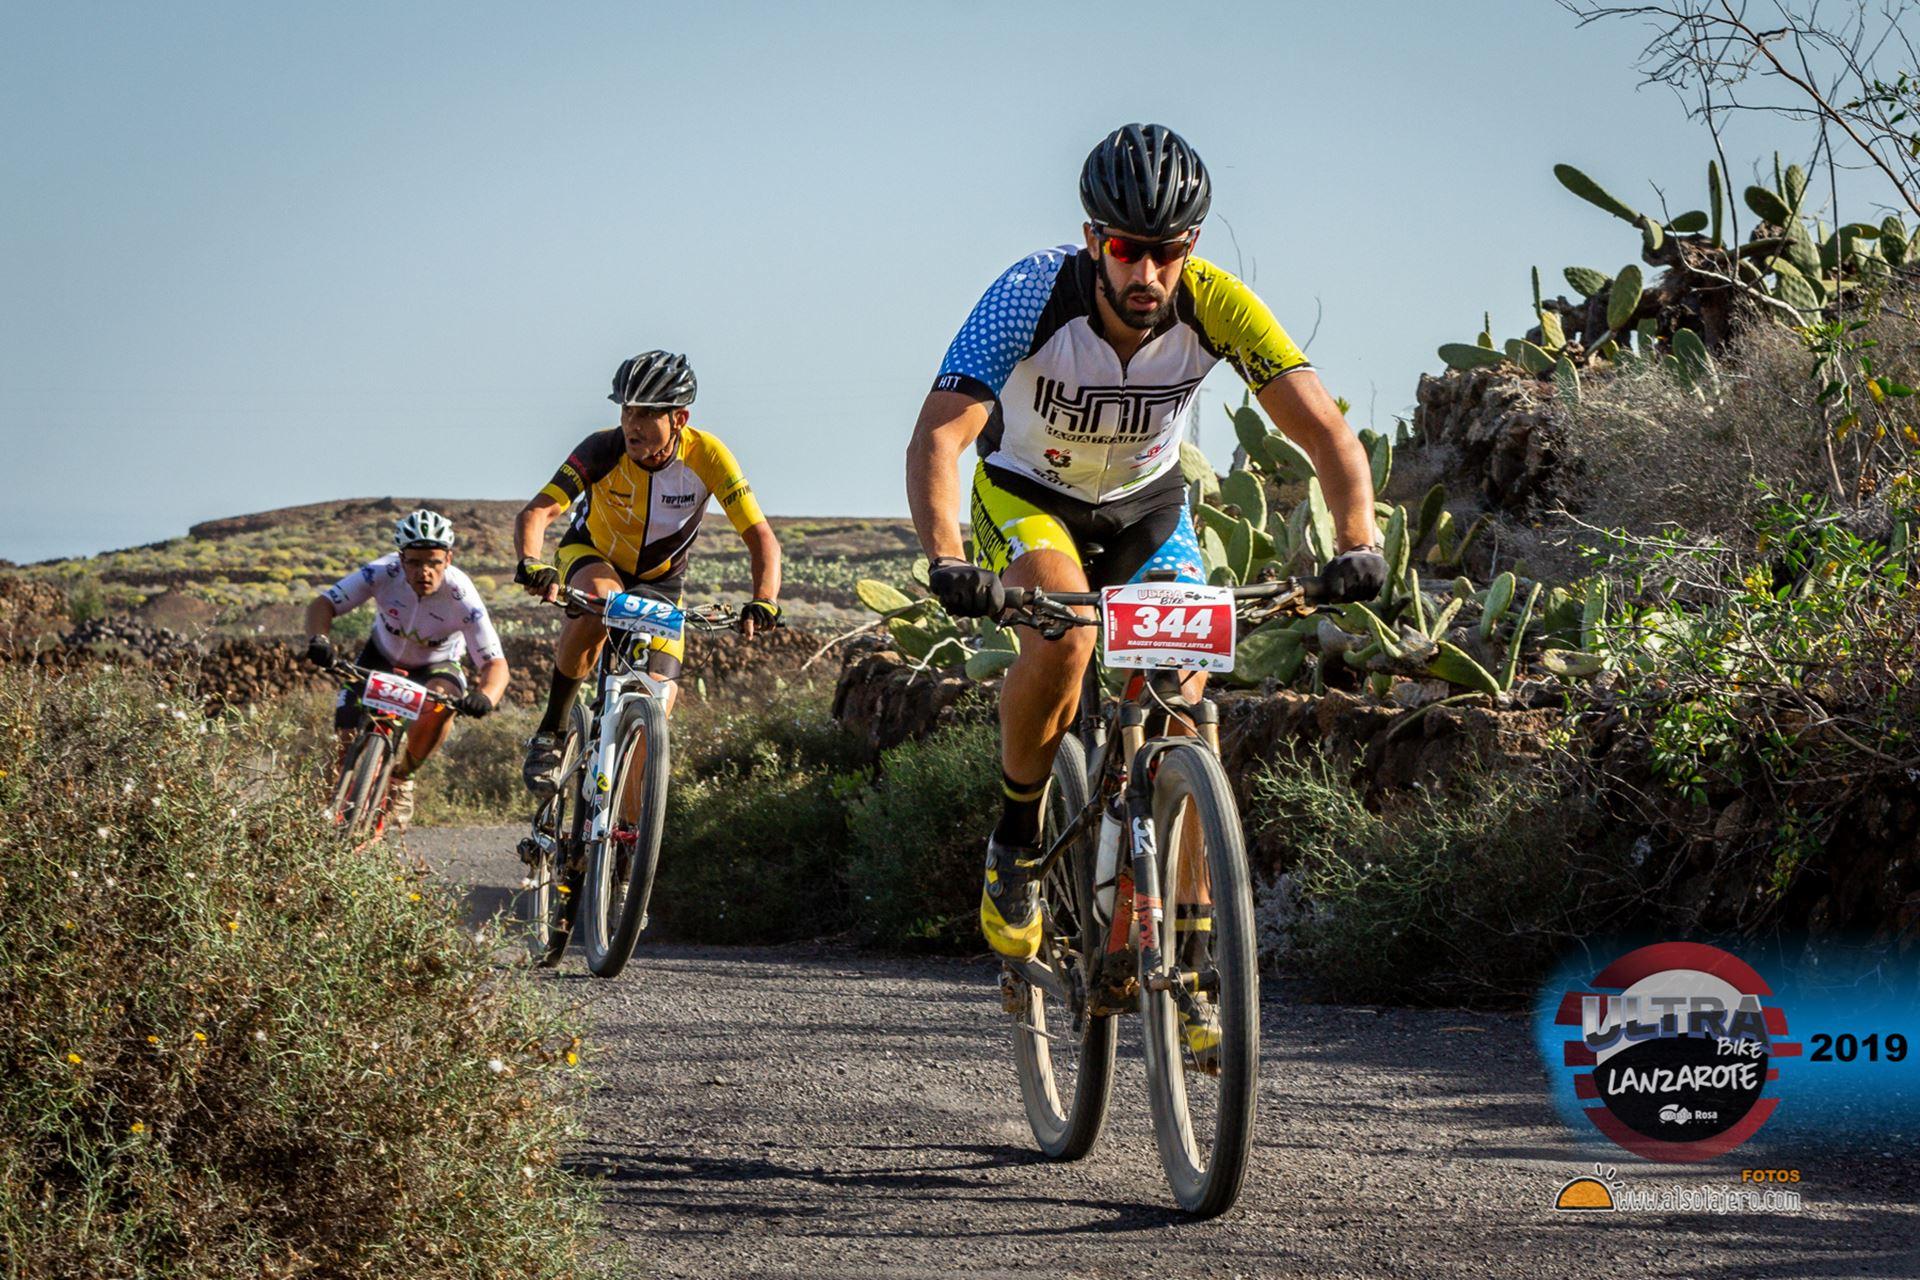 Sector Guatiza 2ª Etapa Ultrabike 2019 Fotos Alsolajero.com-67